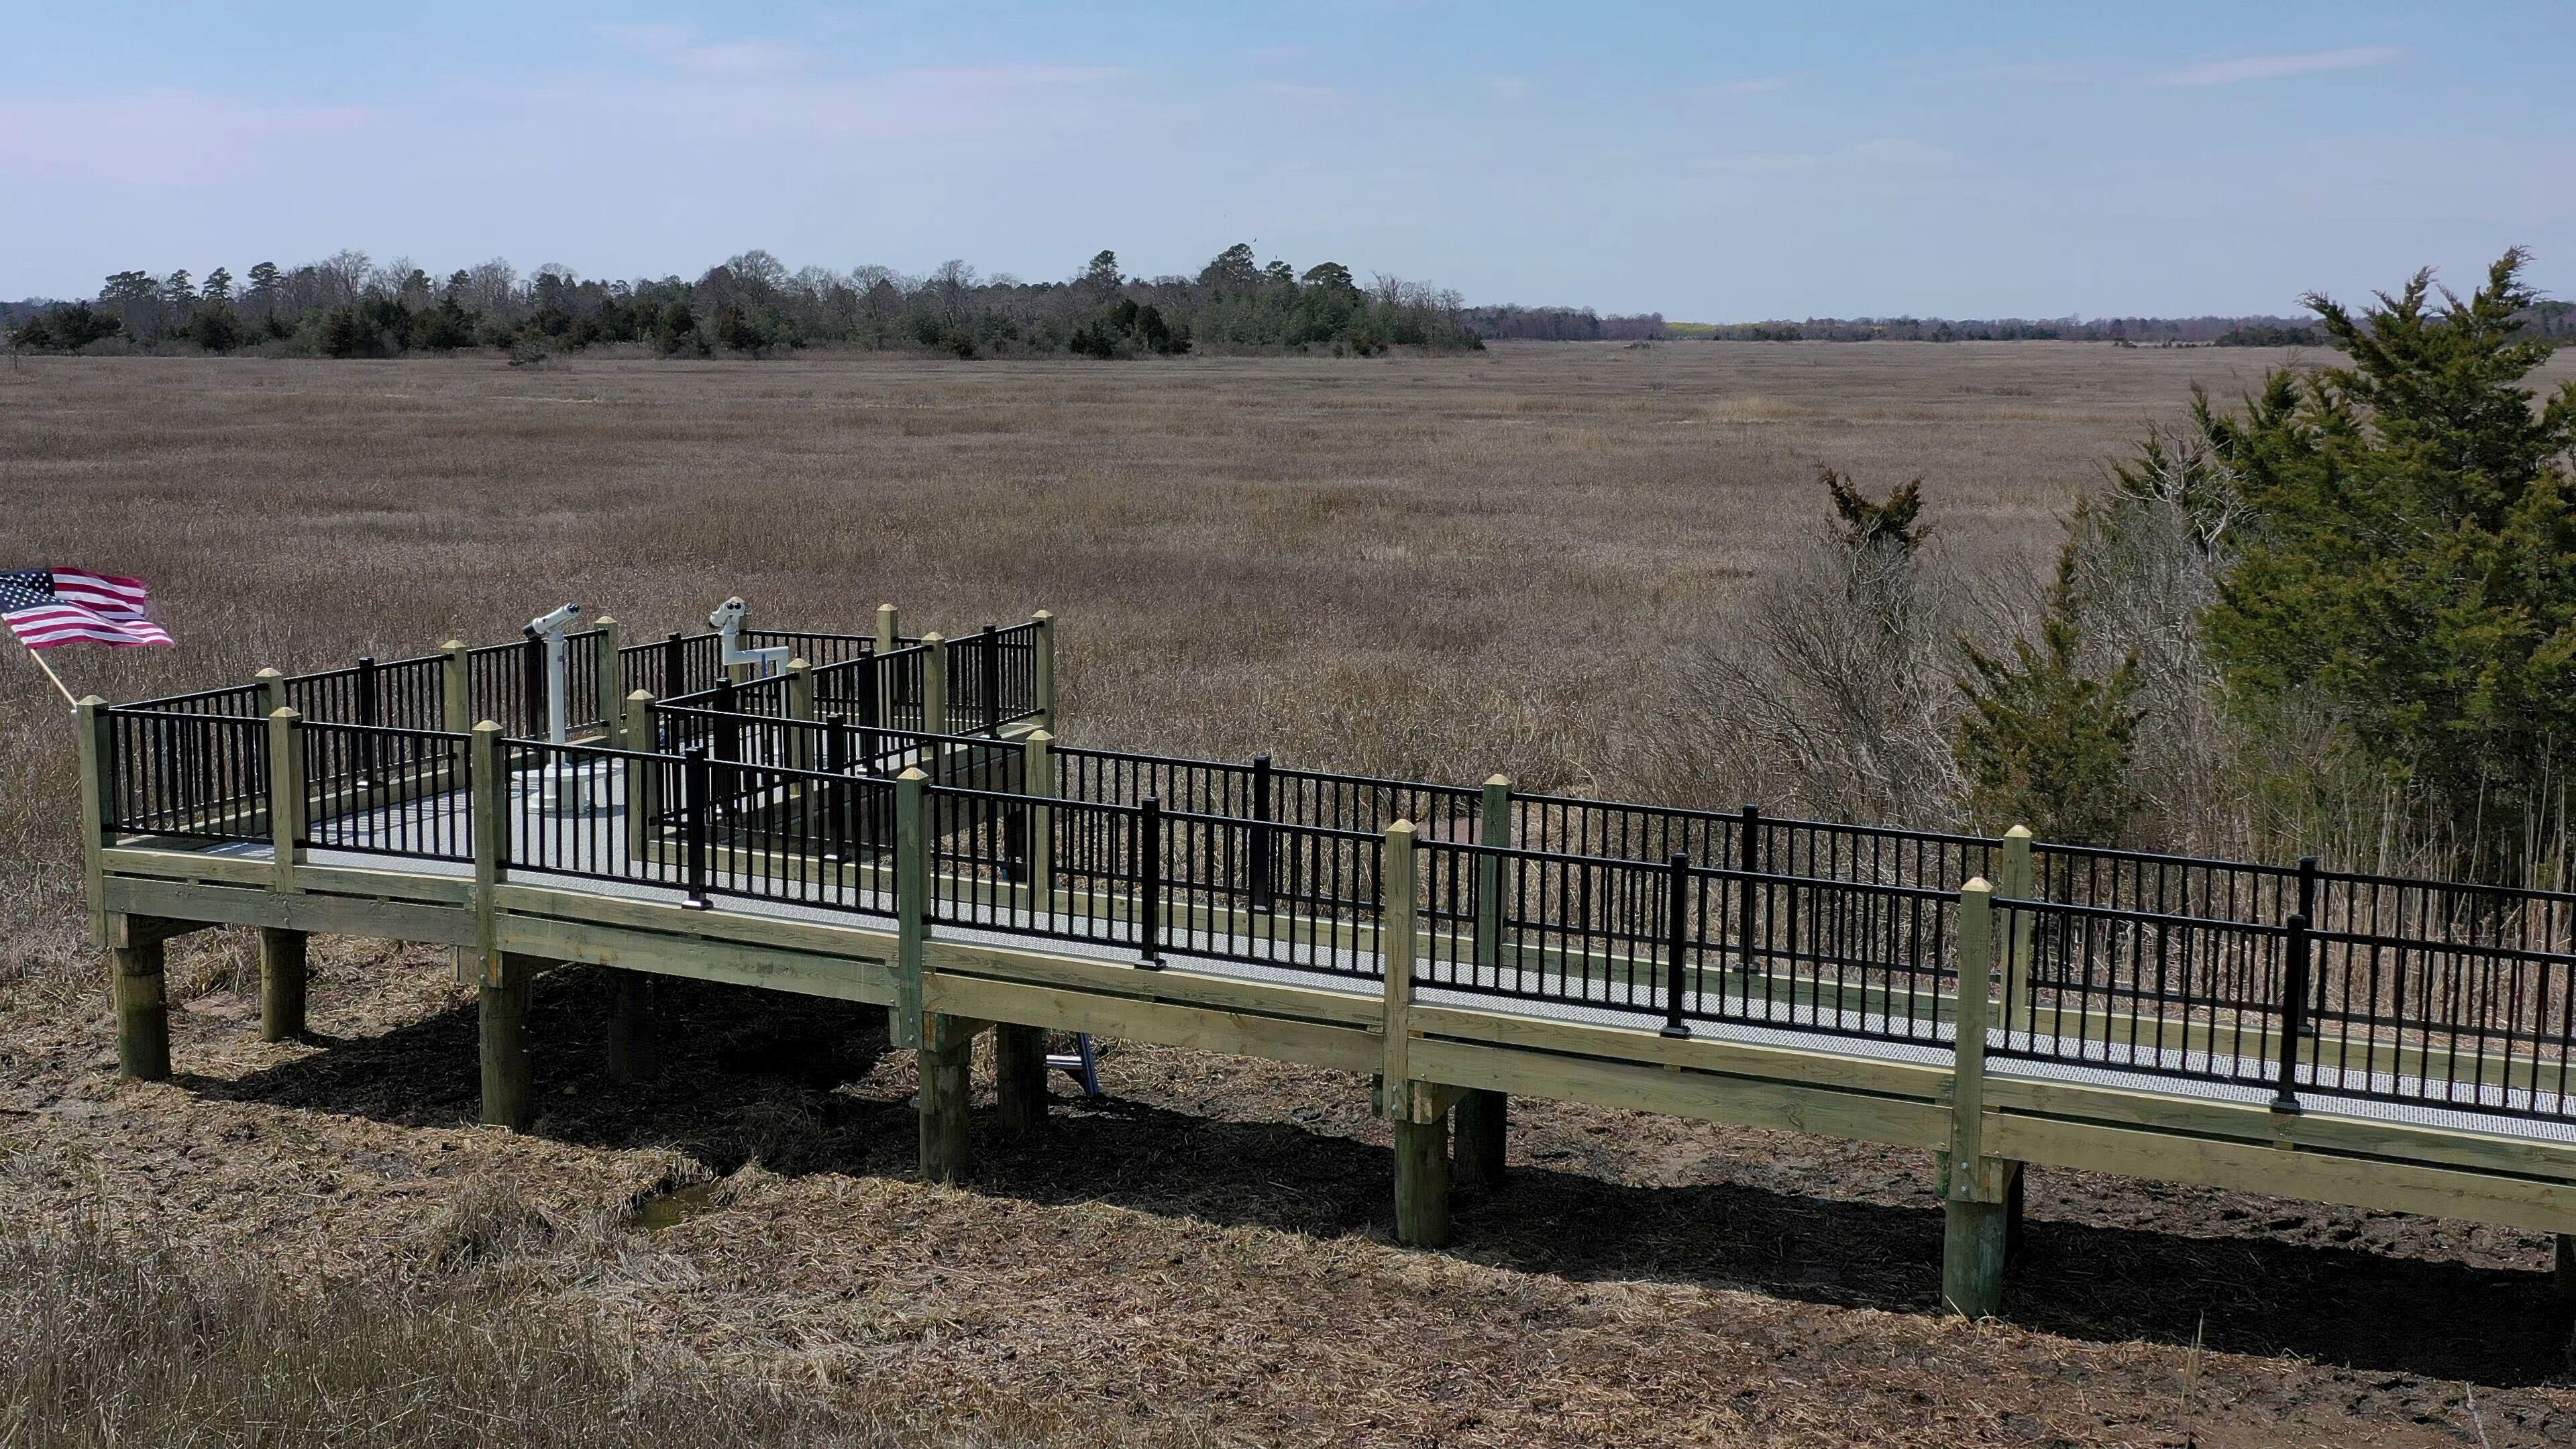 Park Greenway Planning Las Llc Delaware Landscape Architecture Serving Delaware Maryland Pennsylvania Virginia